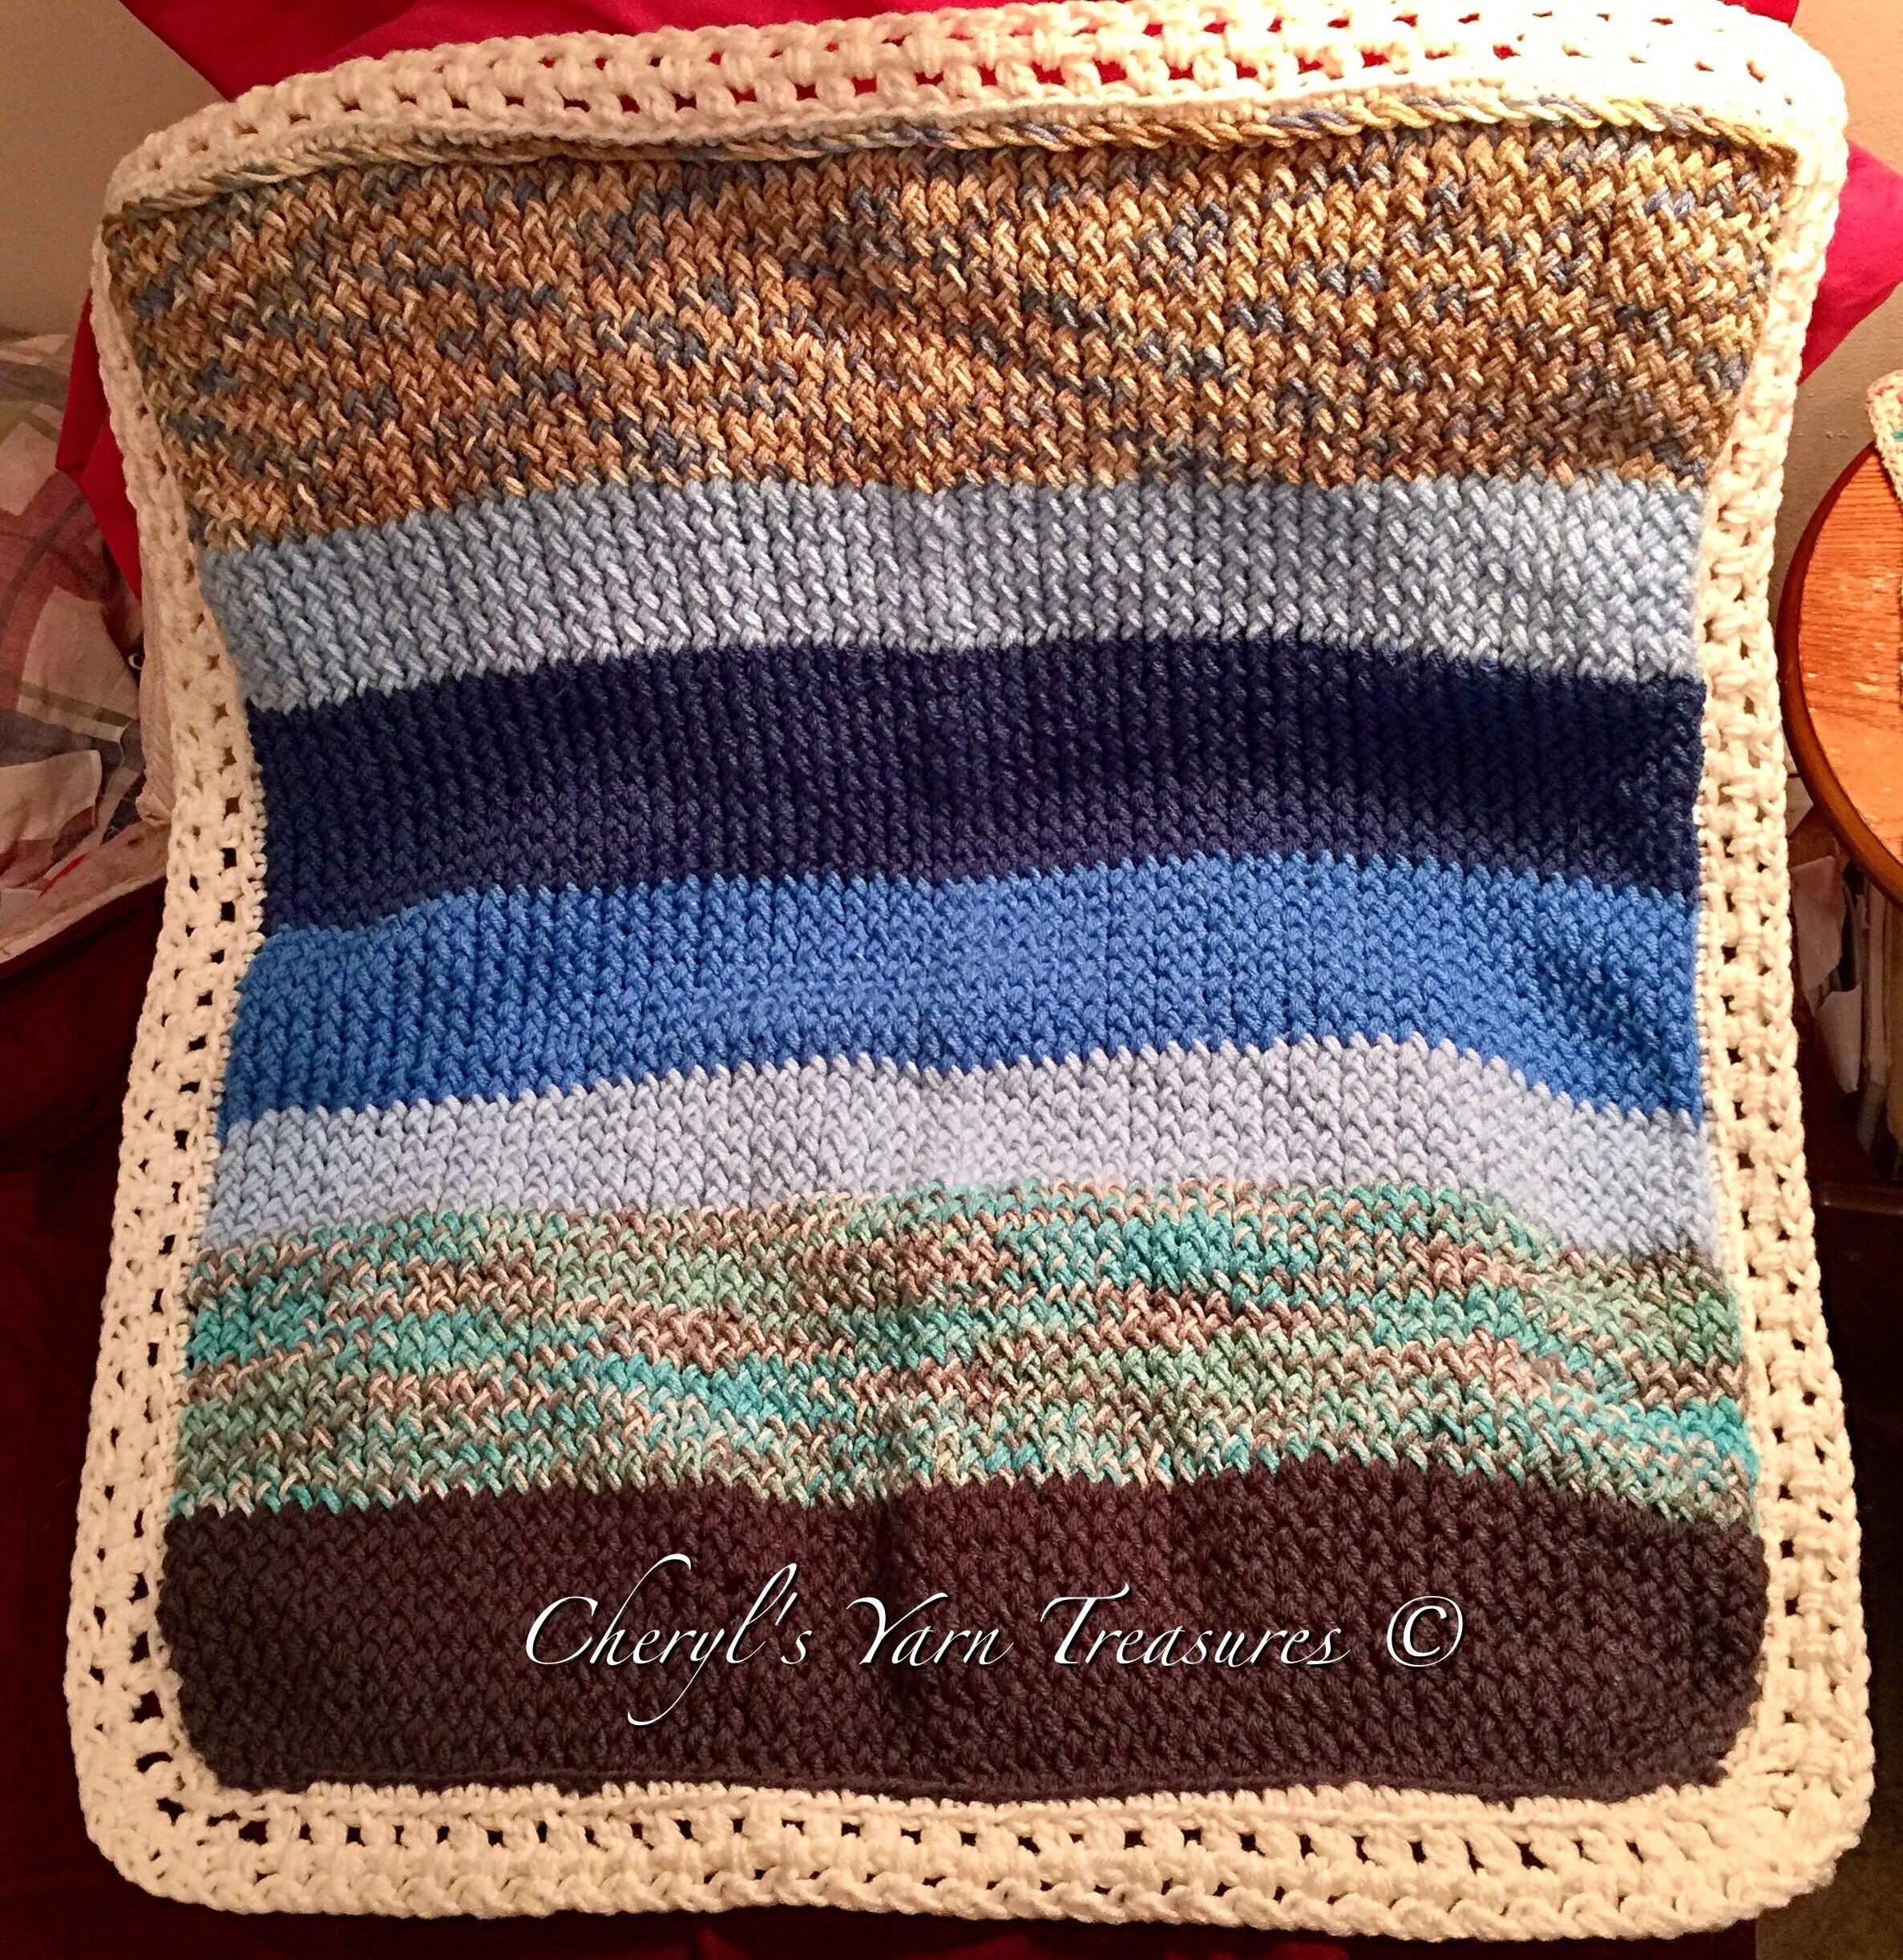 Loom Knit Baby Blanket 31 Long By 28 12 Wide Used Long Orange